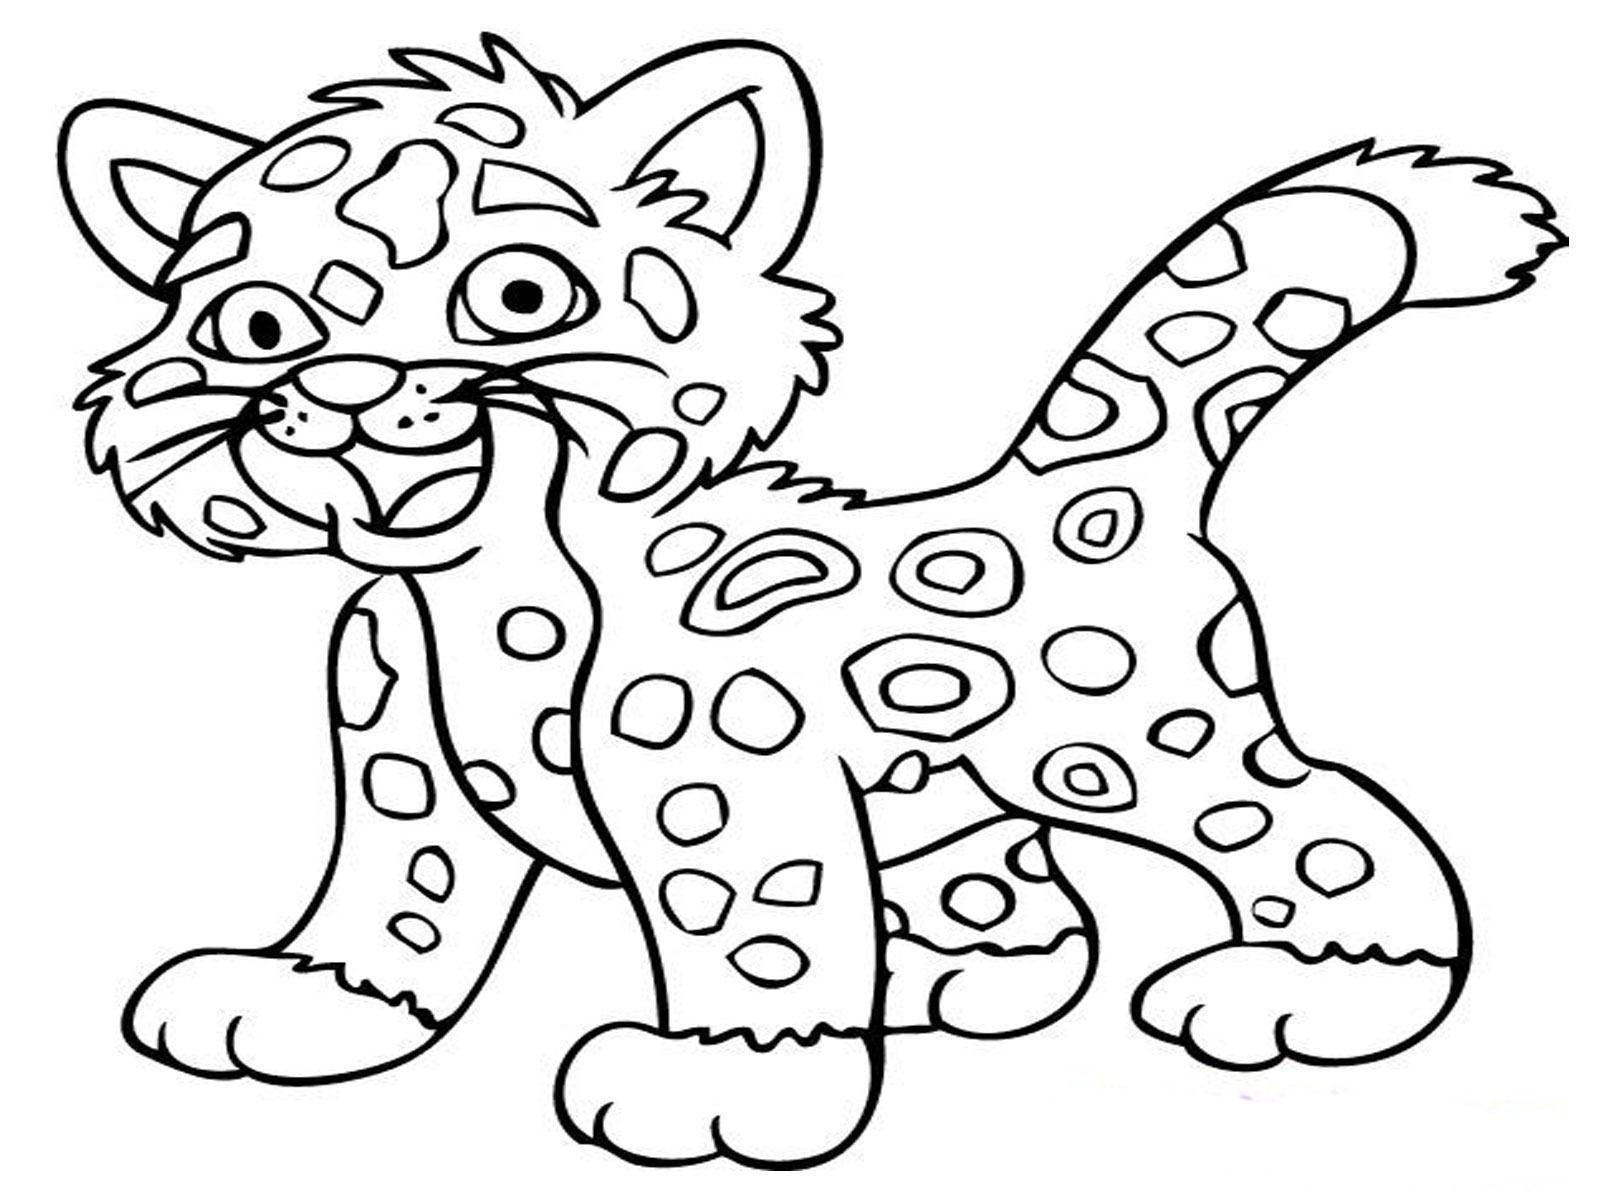 Jaguar Coloring Pages To Print The Jaguar Panthera Onca Is A